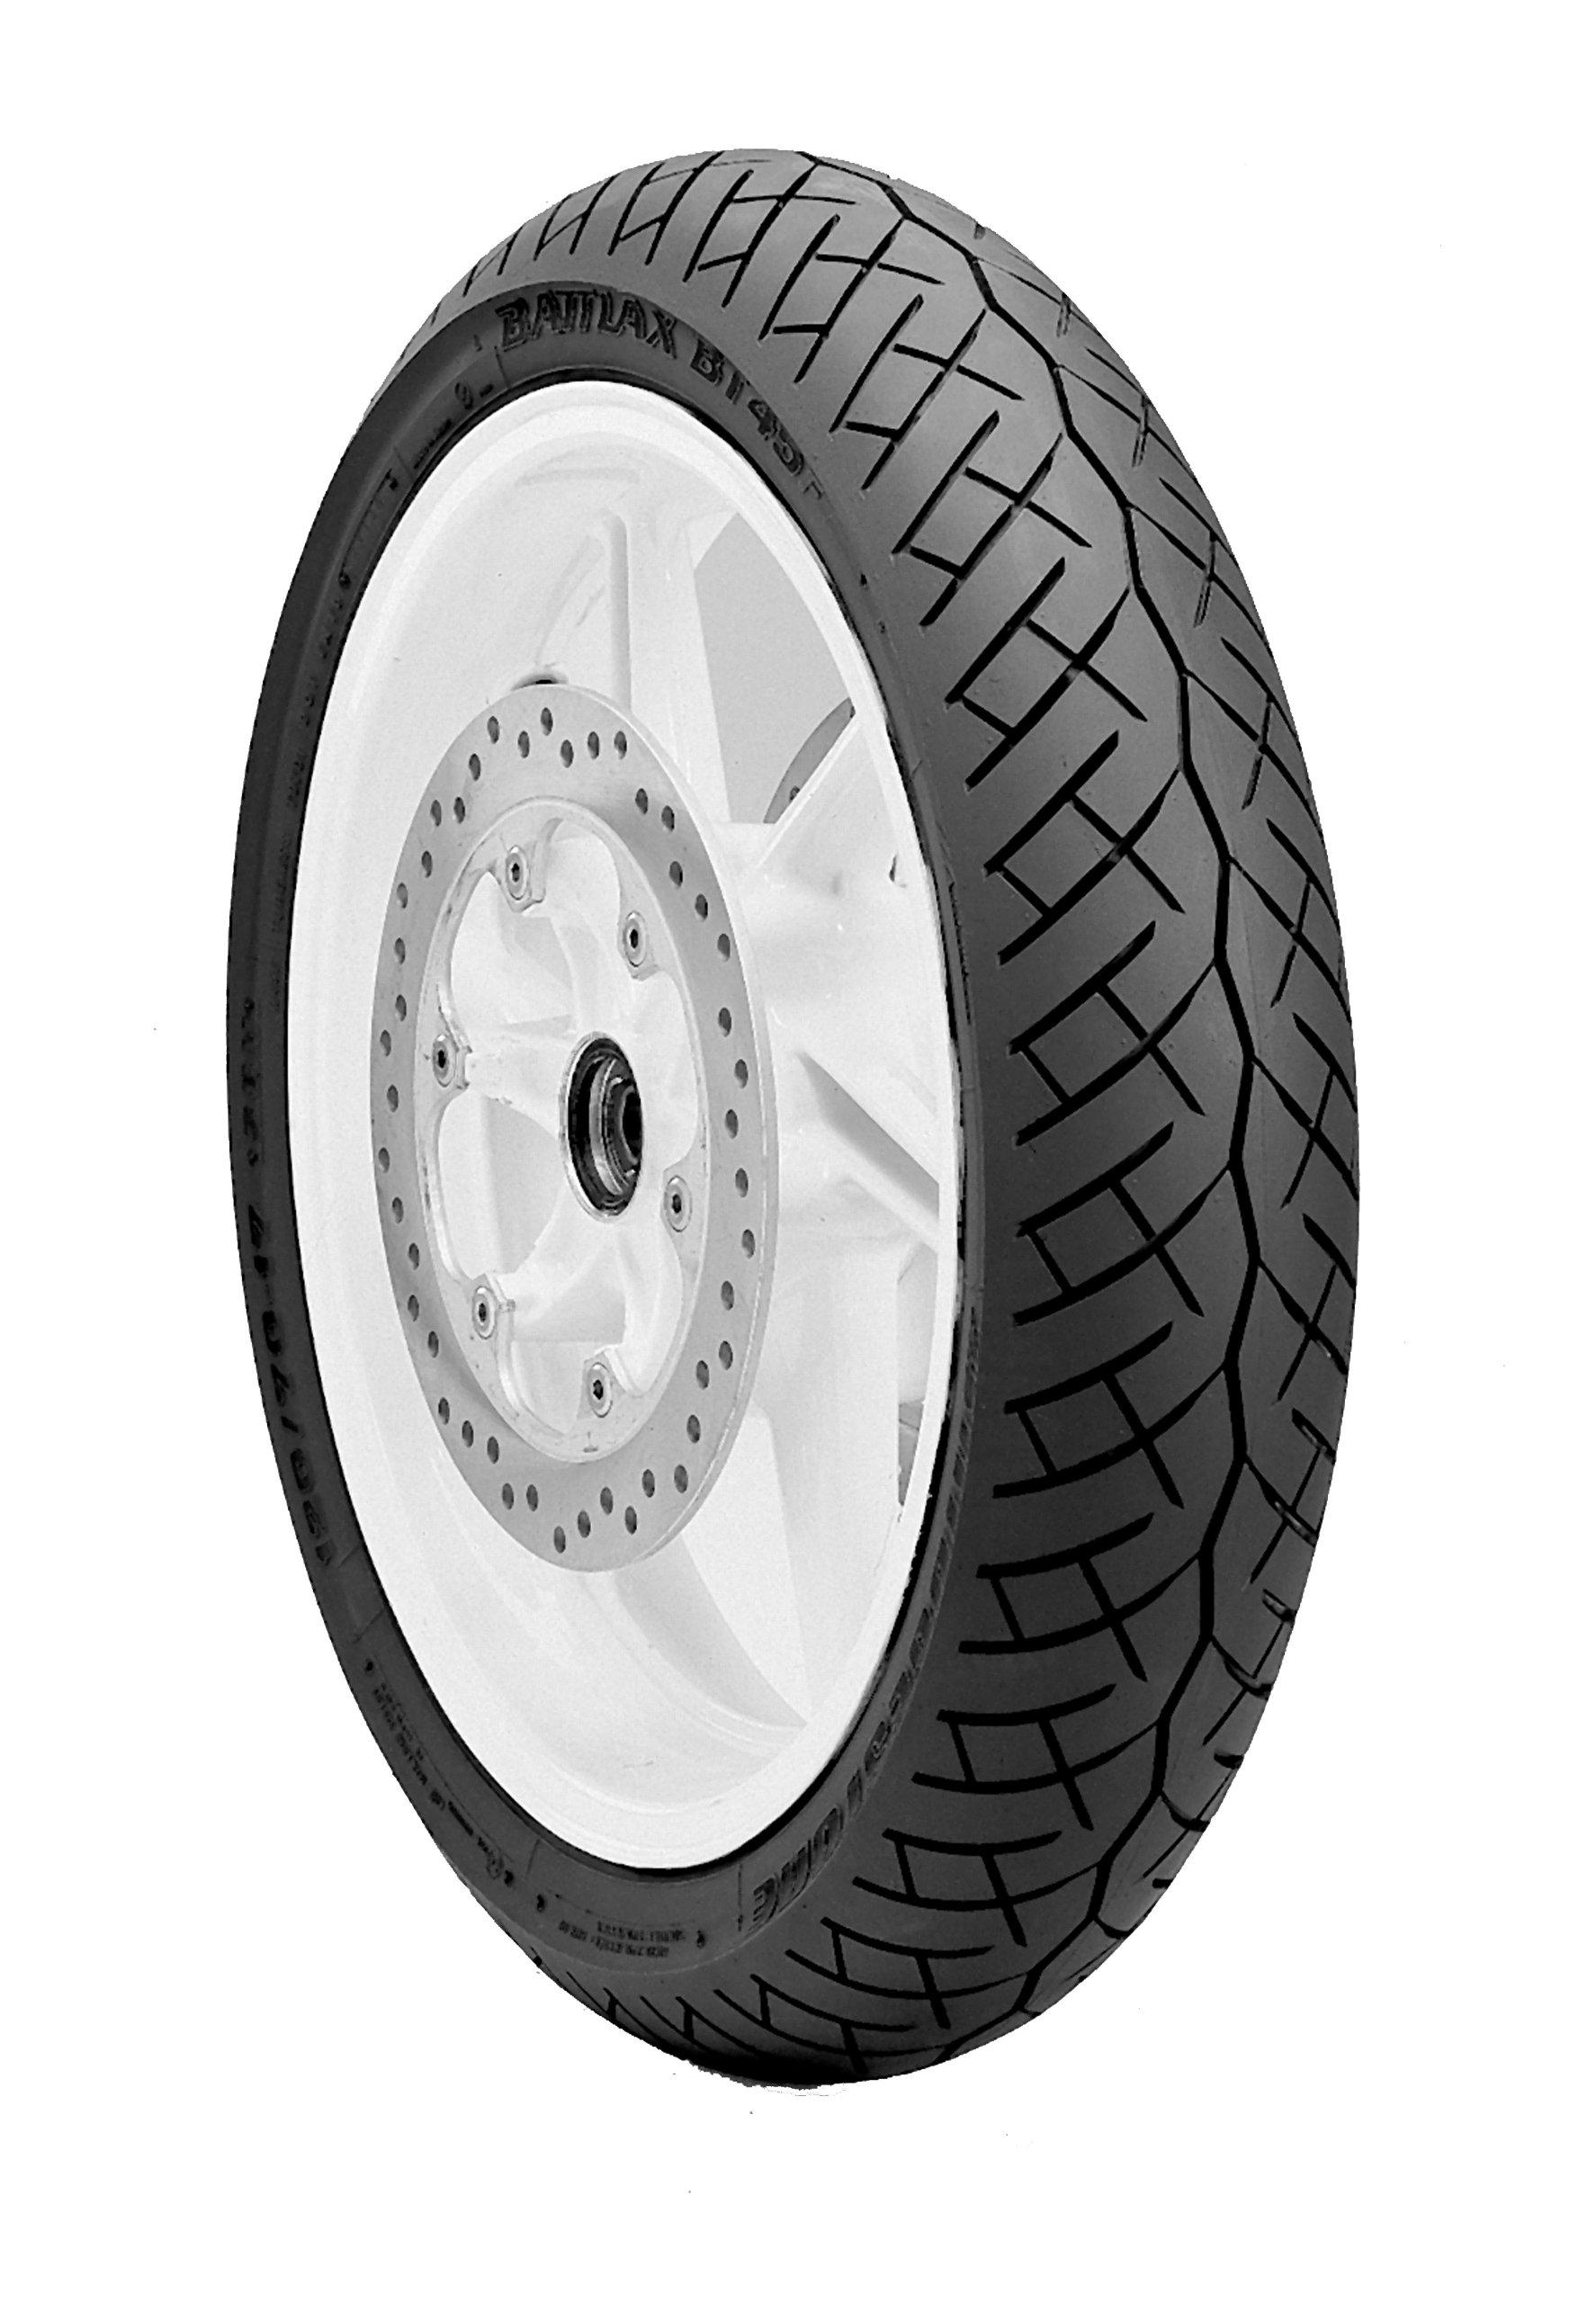 Bridgestone BATTLAX BT-45V Sport/Touring Front Motorcycle Tire 110/80-18